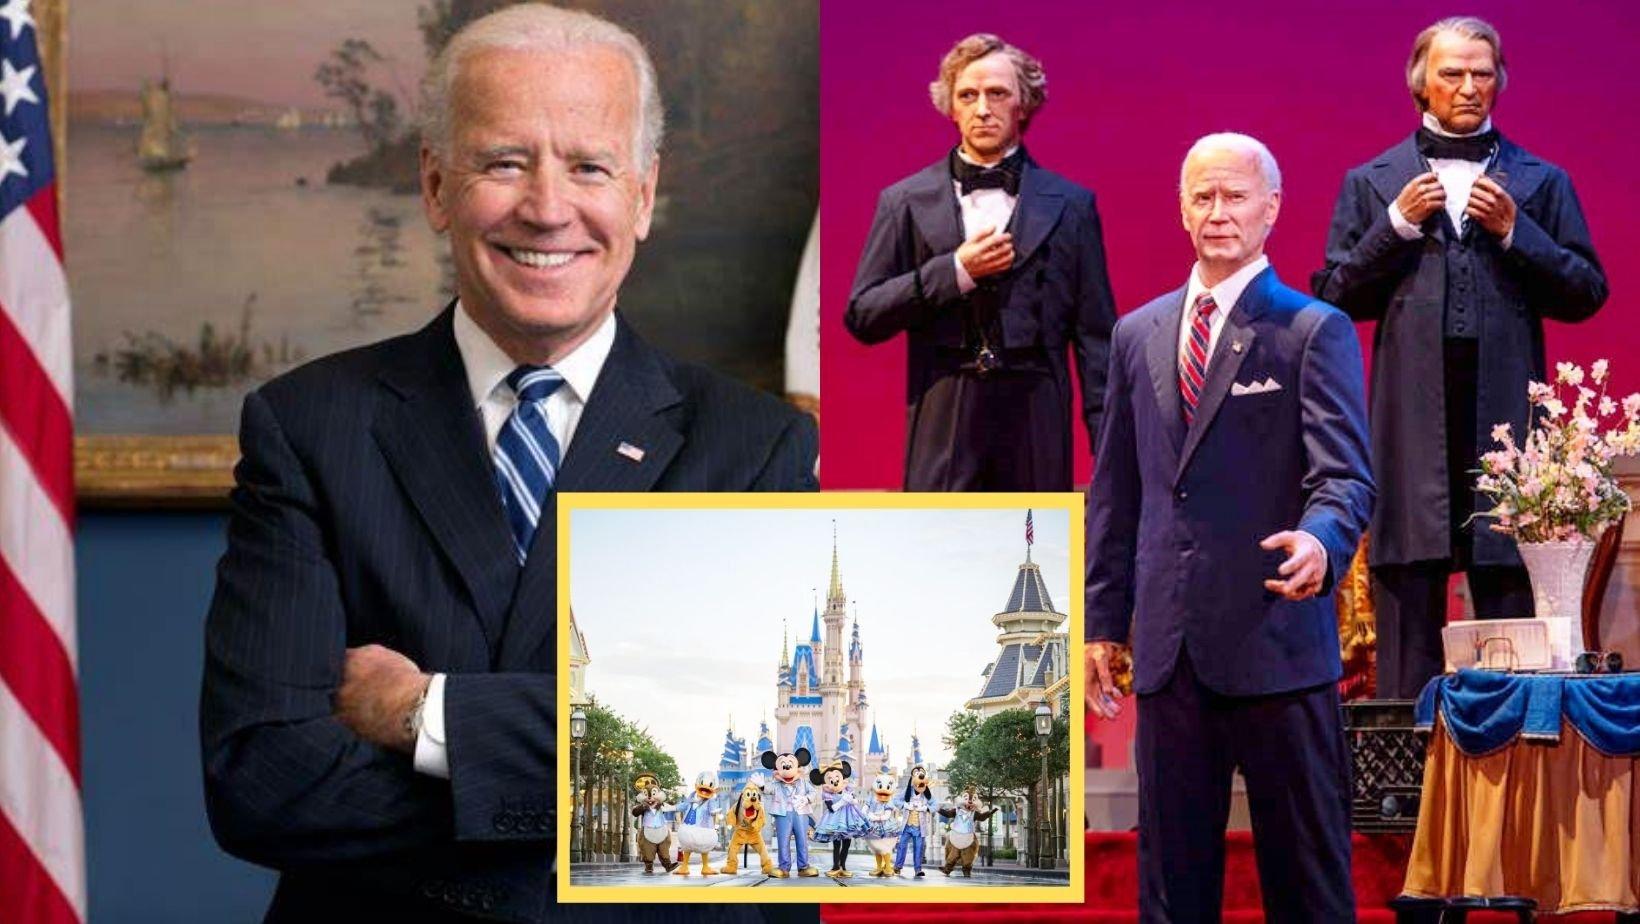 1 73.jpg?resize=1200,630 - A VERY 'REALISTIC' Joe Biden Robot Will Be Installed In Disney World's Hall Of Presidents